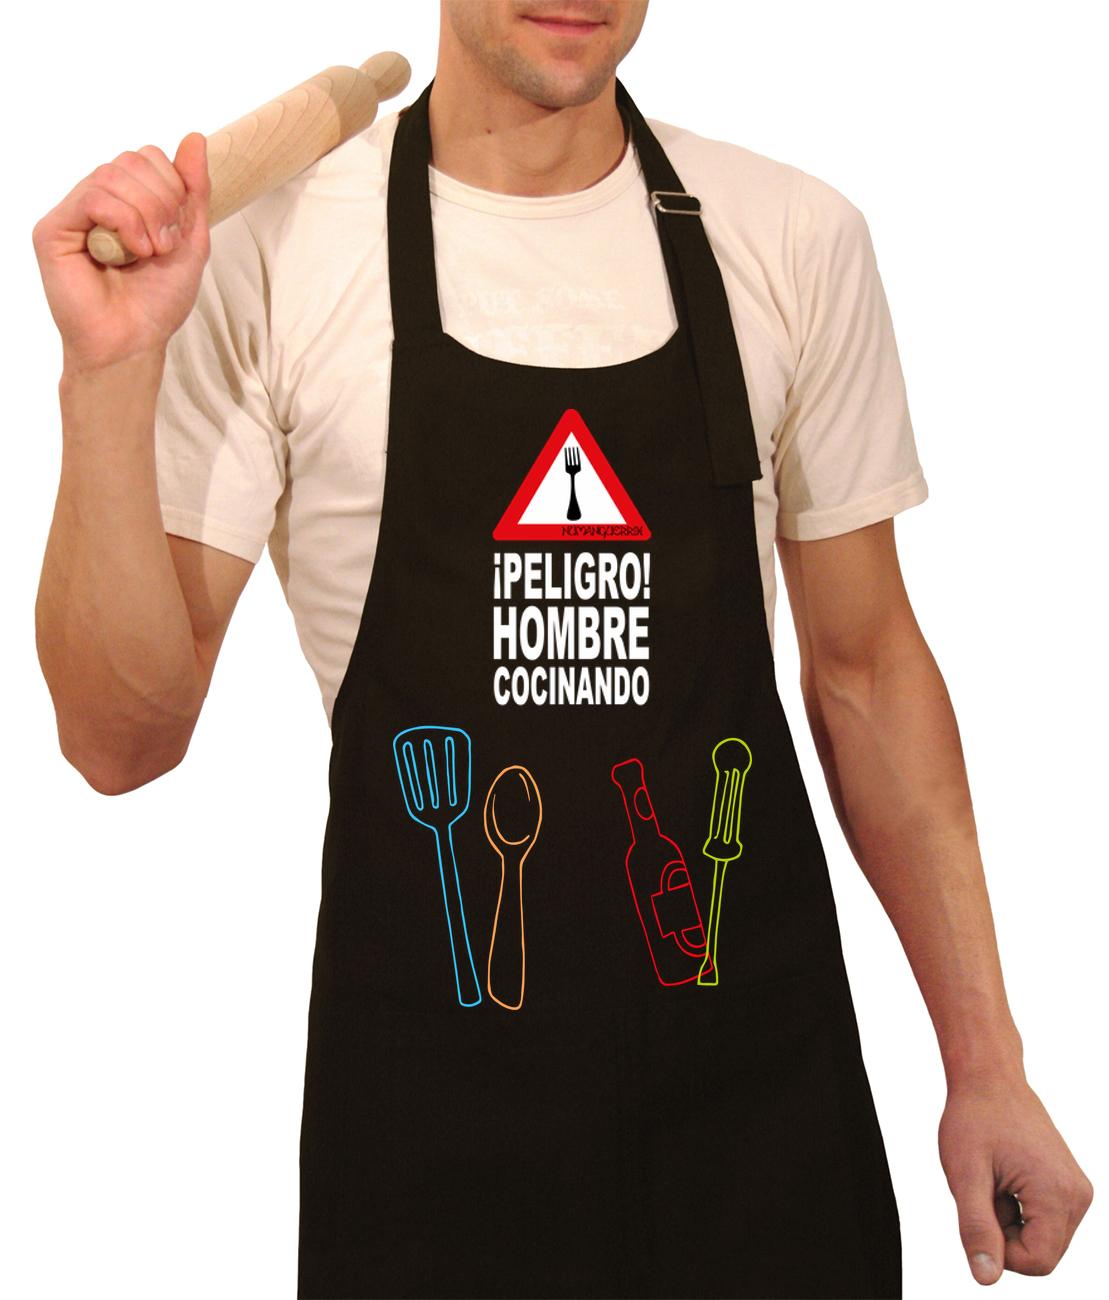 Peligro hombre cocinando